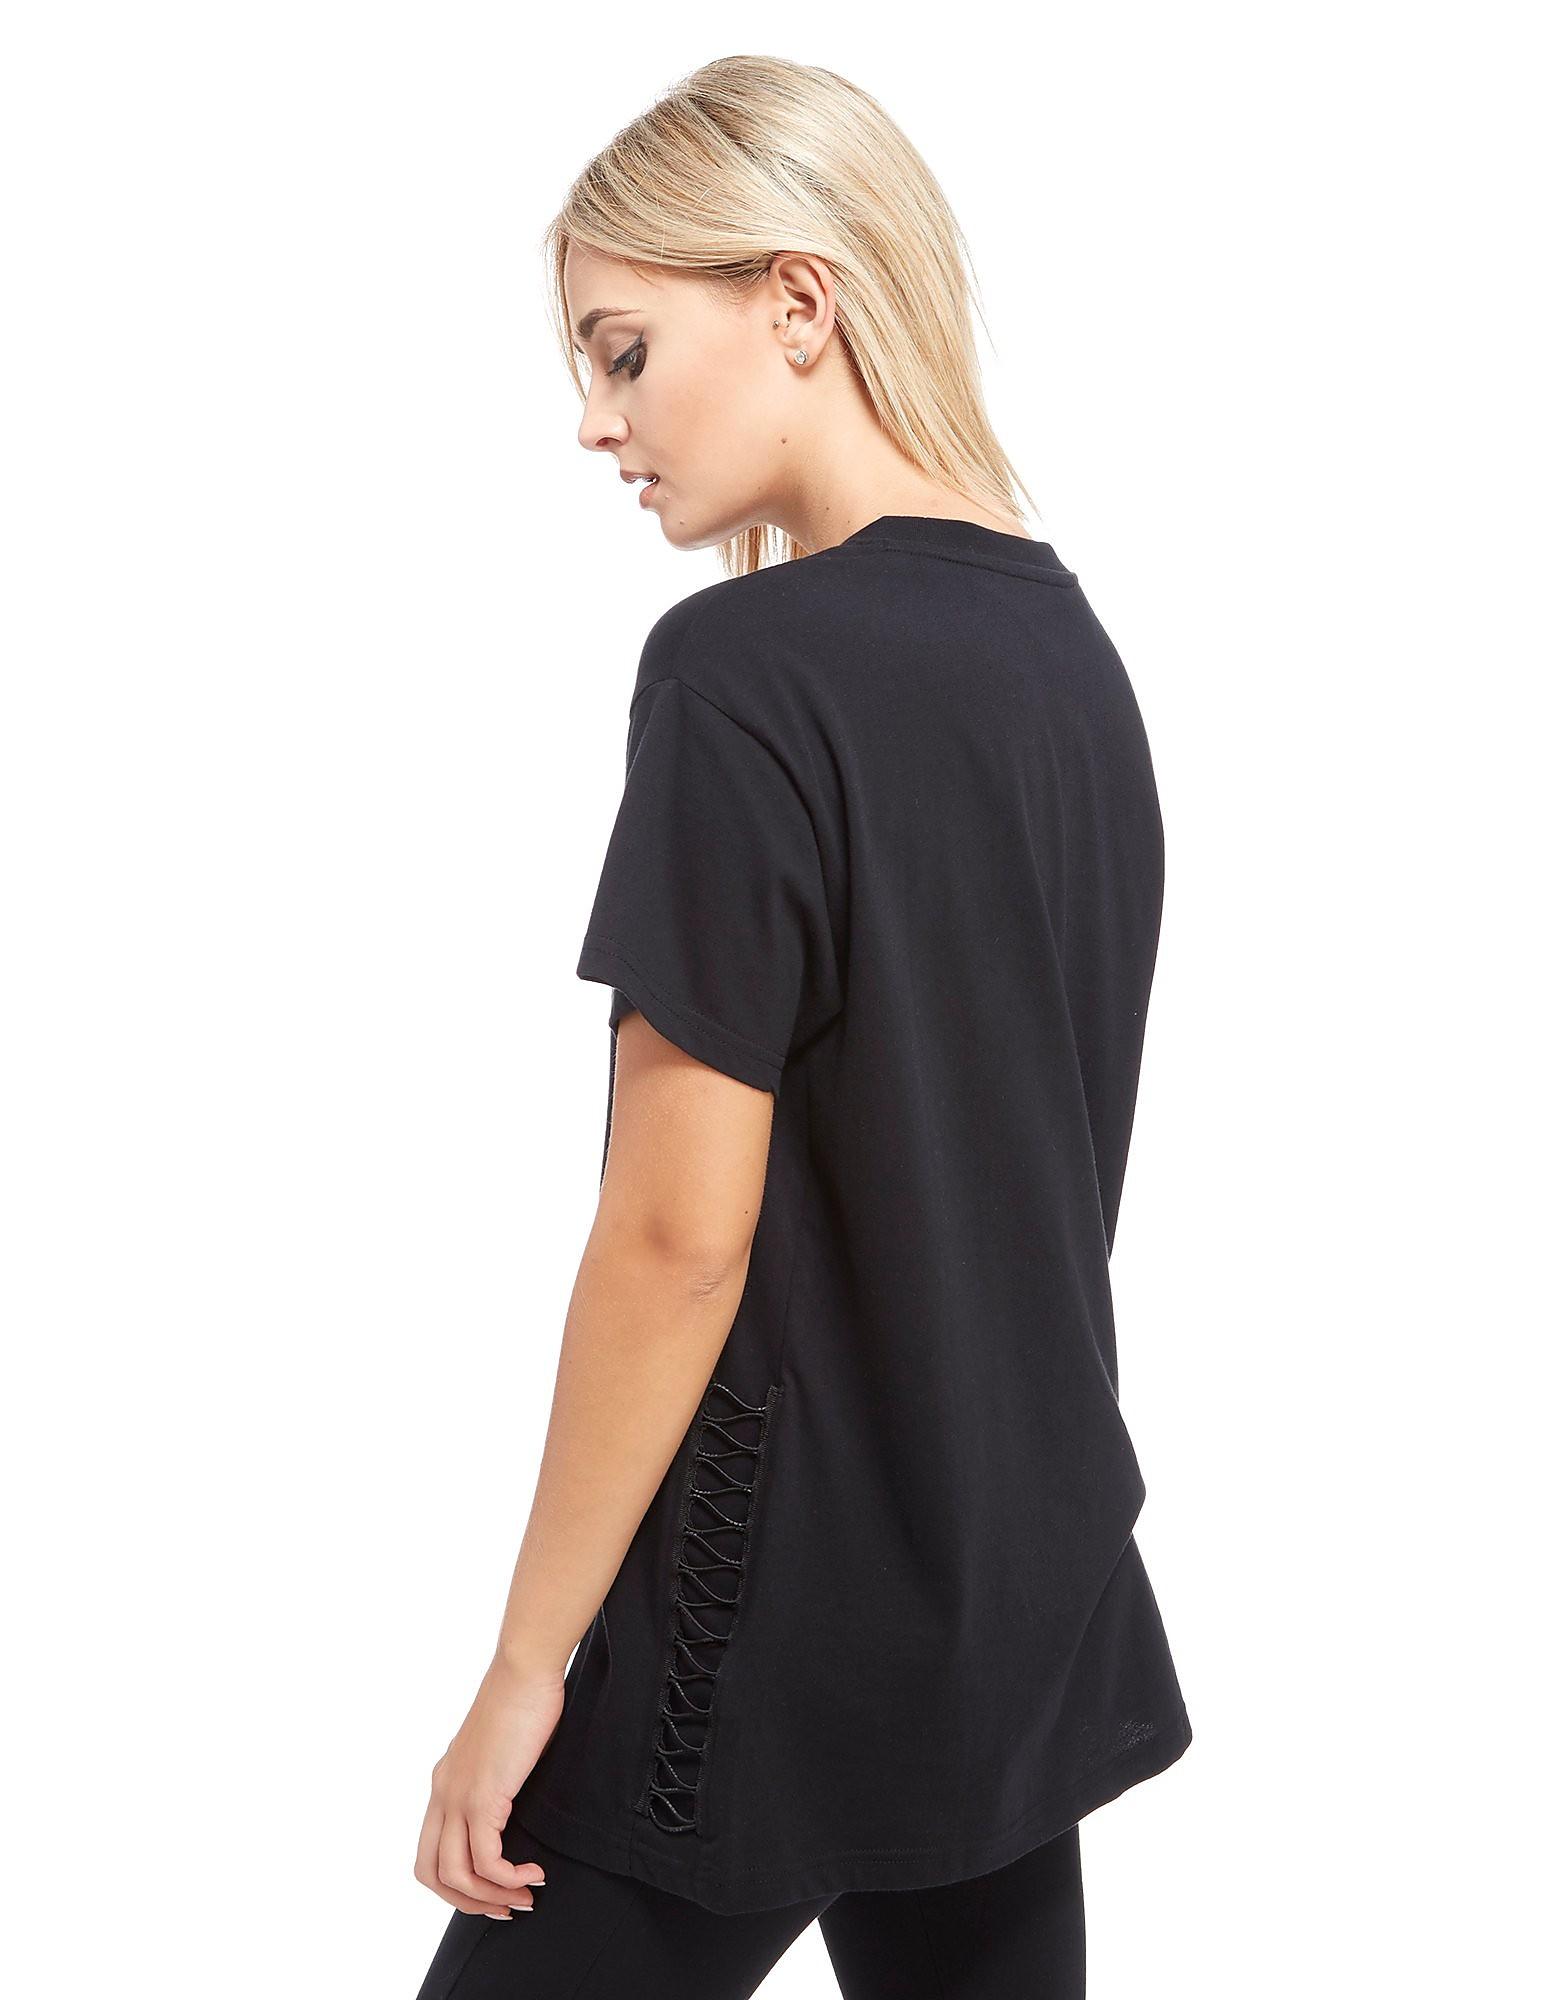 PUMA Lace Up Boyfriend T-Shirt